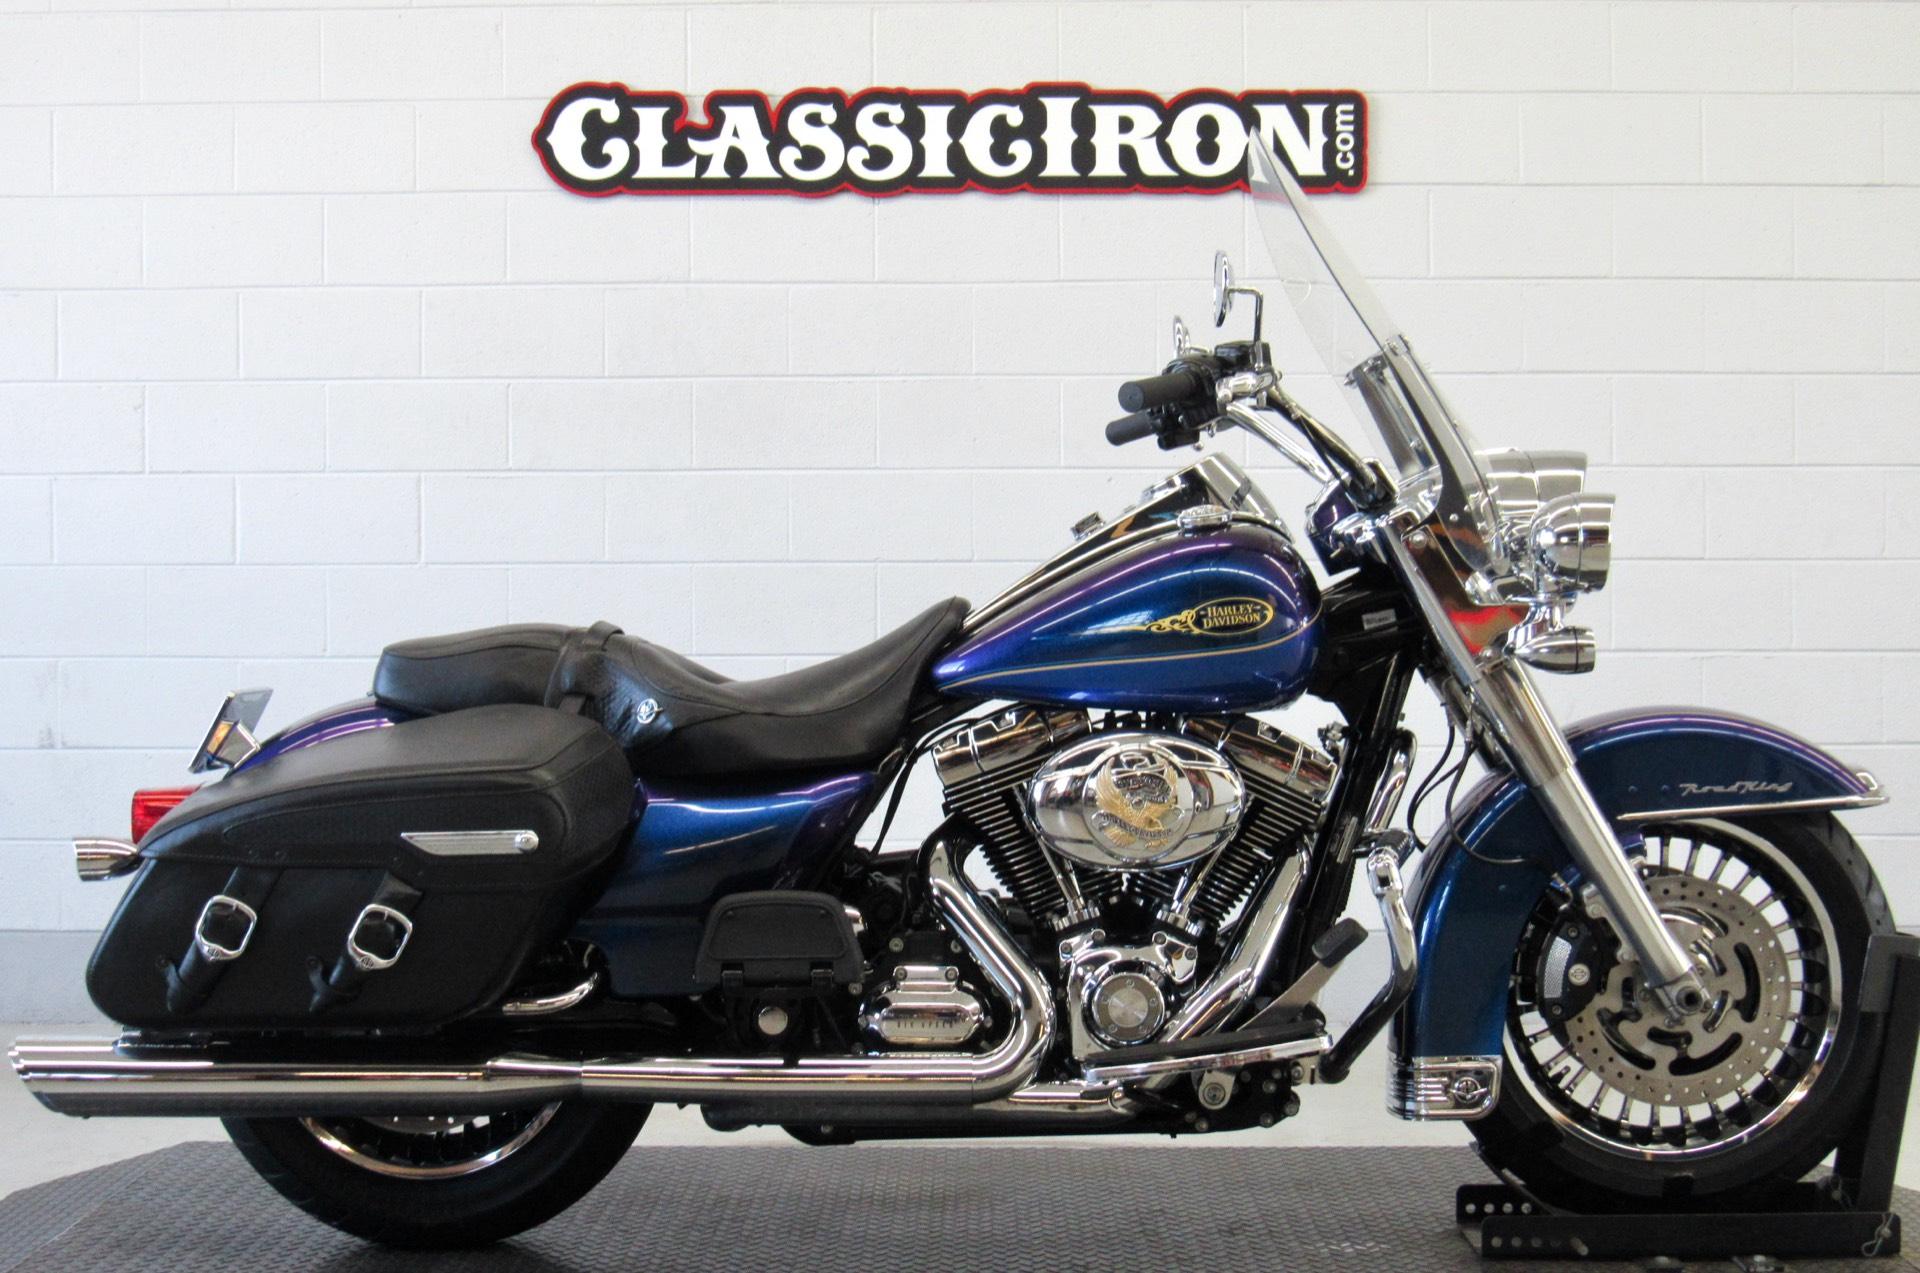 Used 2009 Harley Davidson Road King Classic Black Ice Blue Ice Motorcycles In Fredericksburg Va 9389